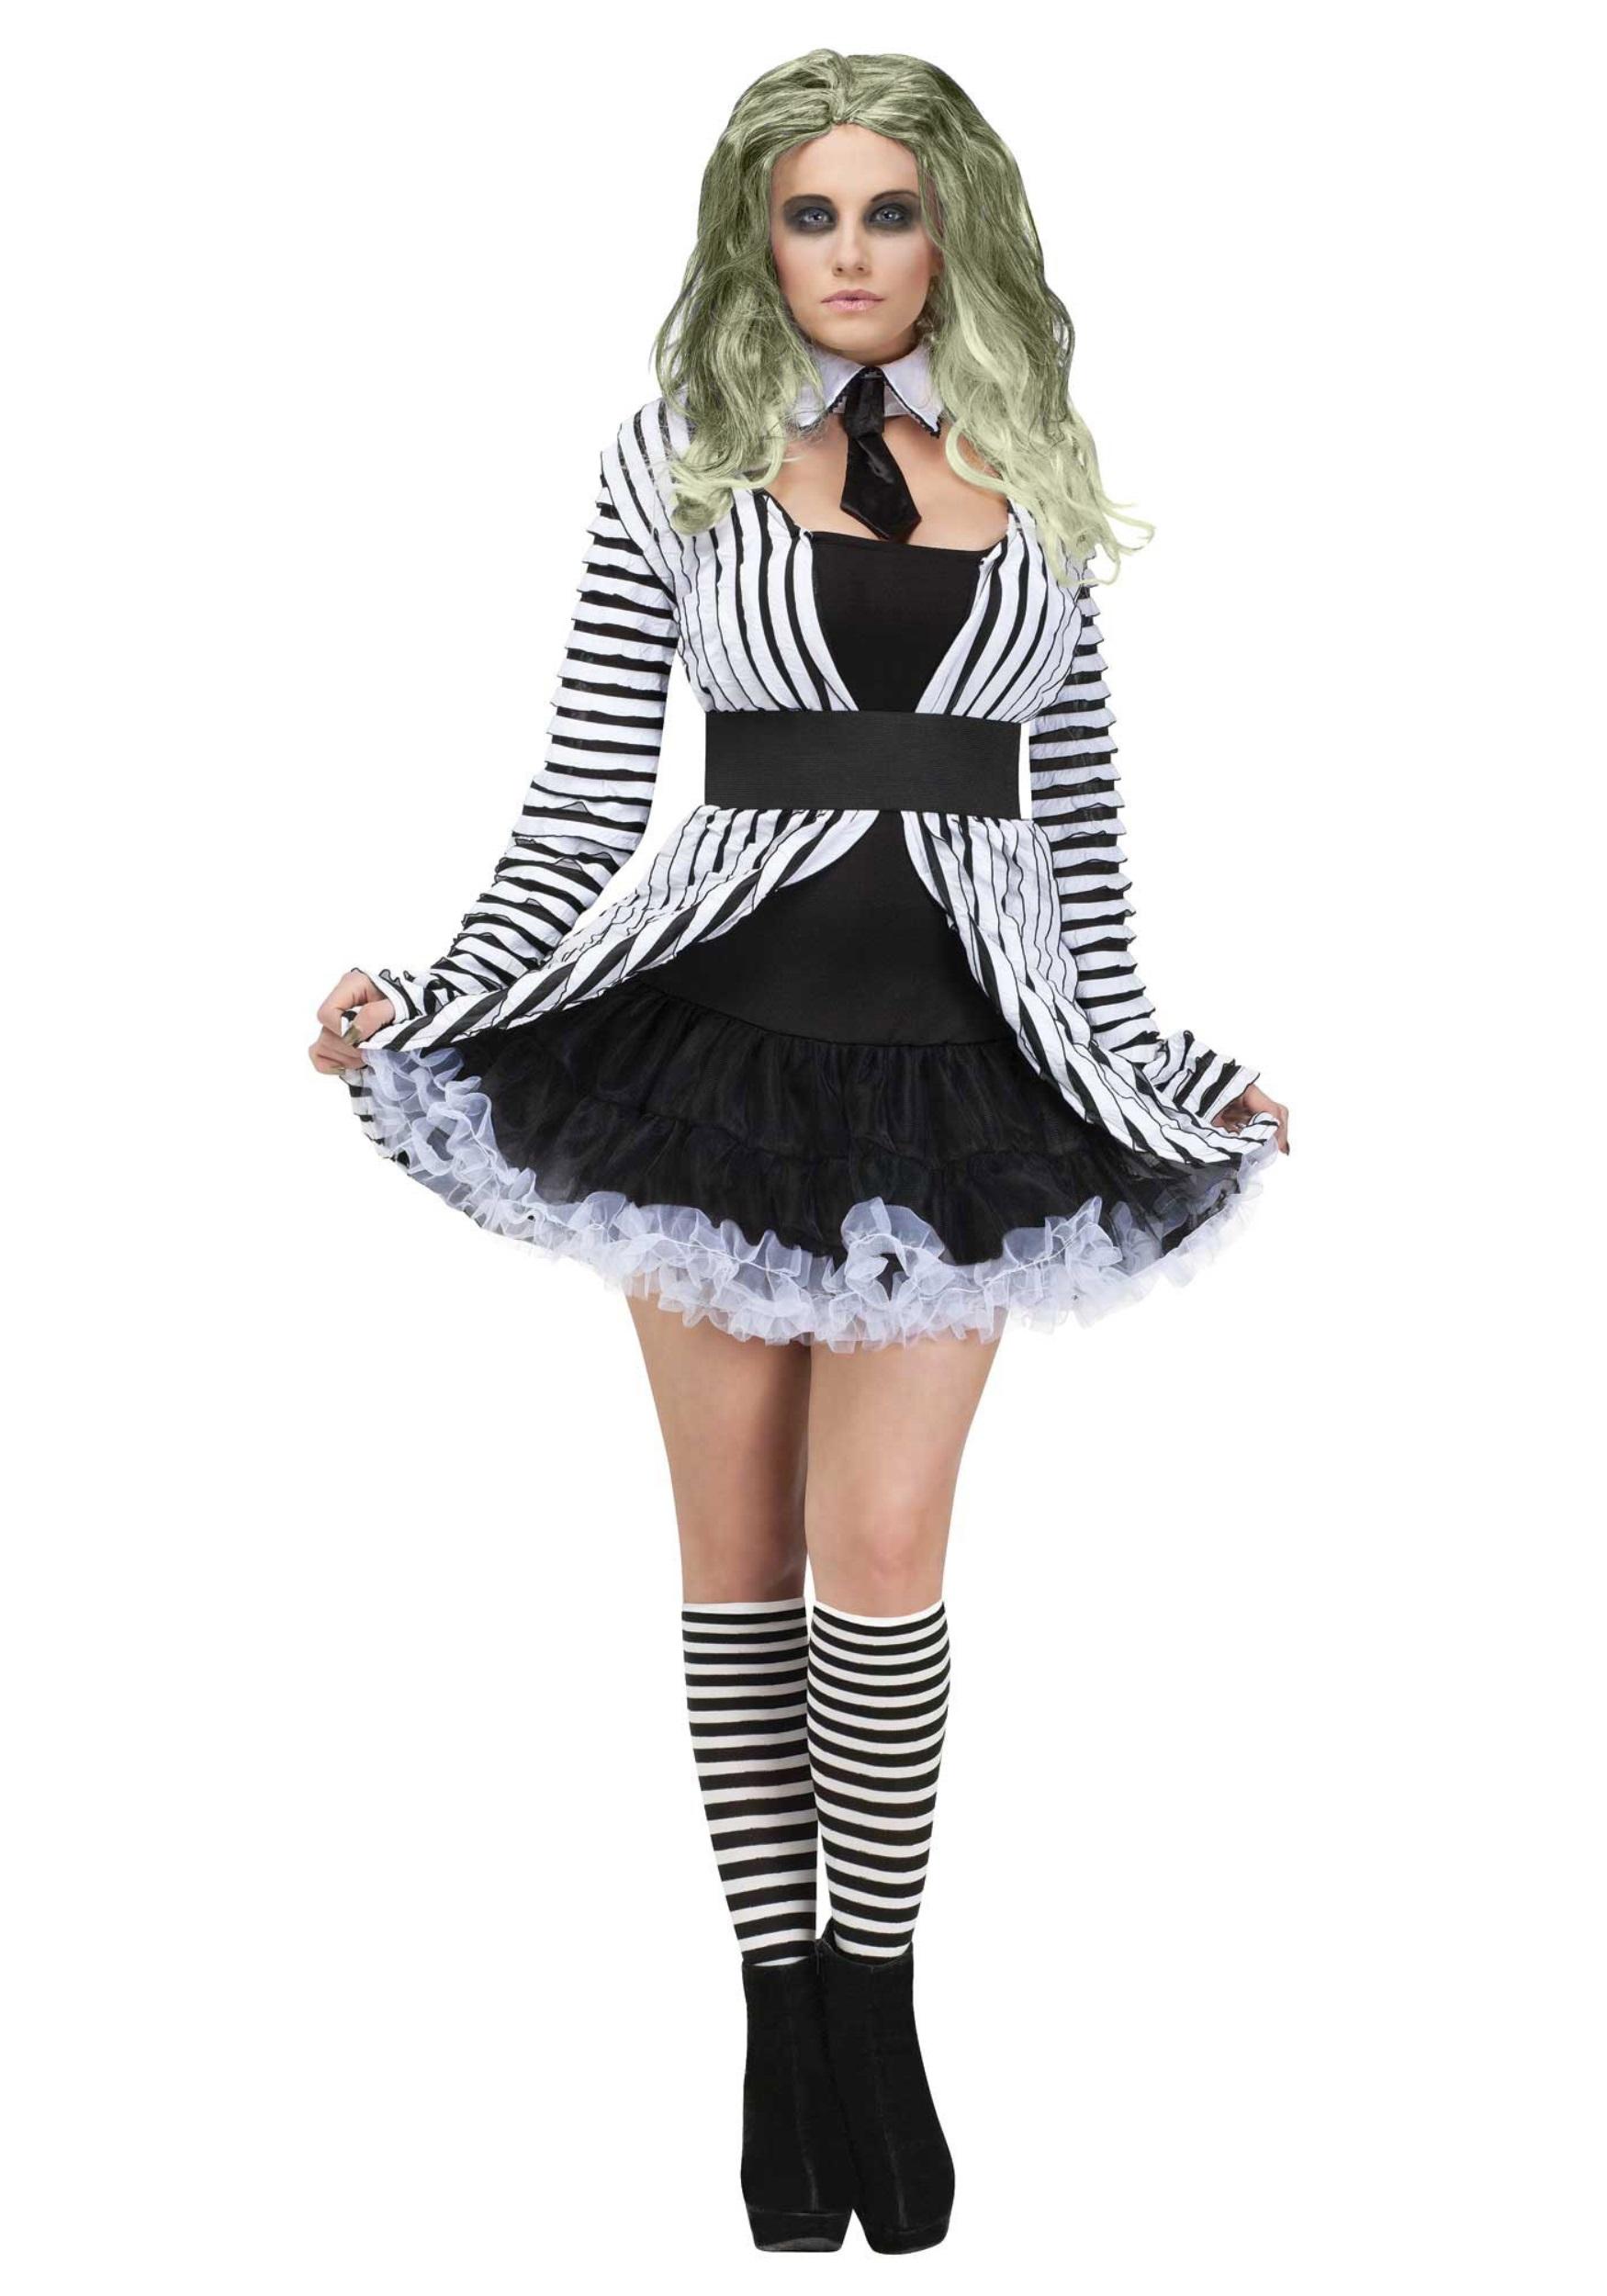 Womens Beetlegeuse Baby Costume Halloween Costume Ideas 2019